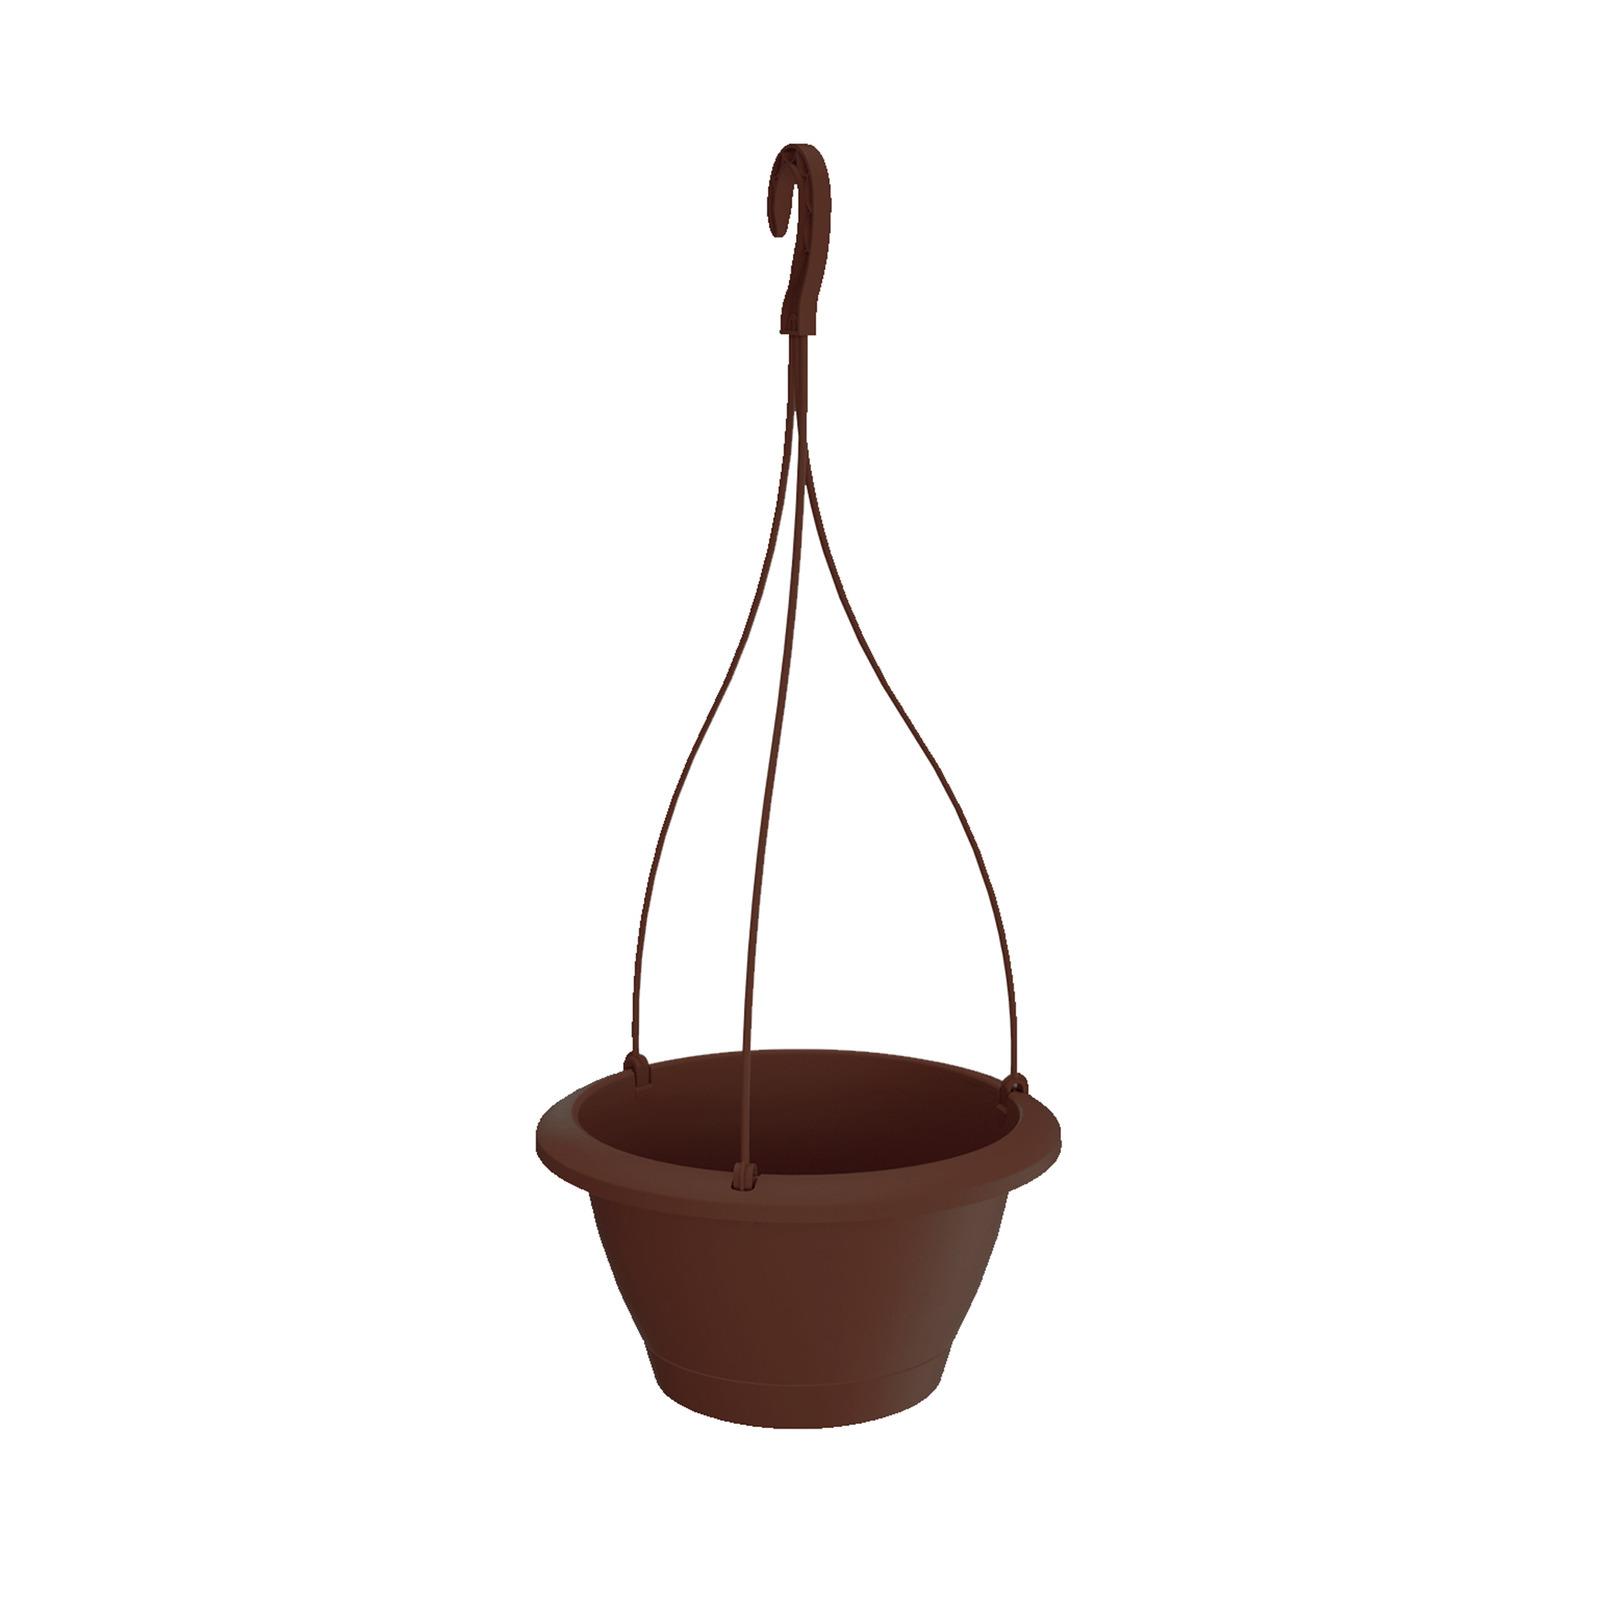 Prosperplast Respana Hanger Pot (270 x 145MM) Brown